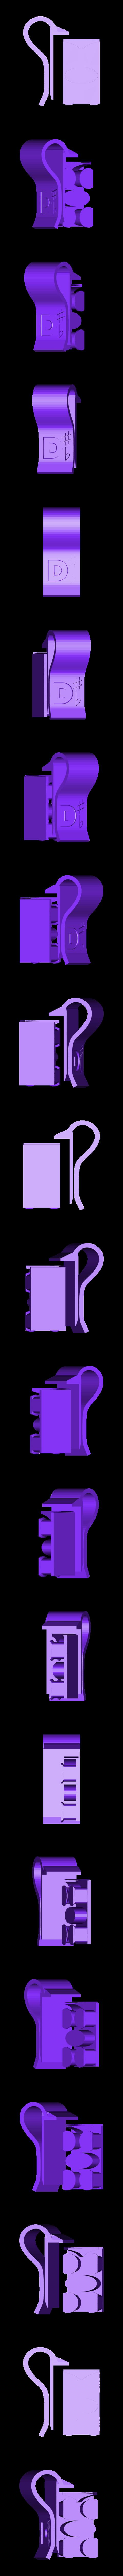 CordClip_r3.10_final.stl Download free STL file Headphone Cord Clip • 3D printer object, dustnnotes